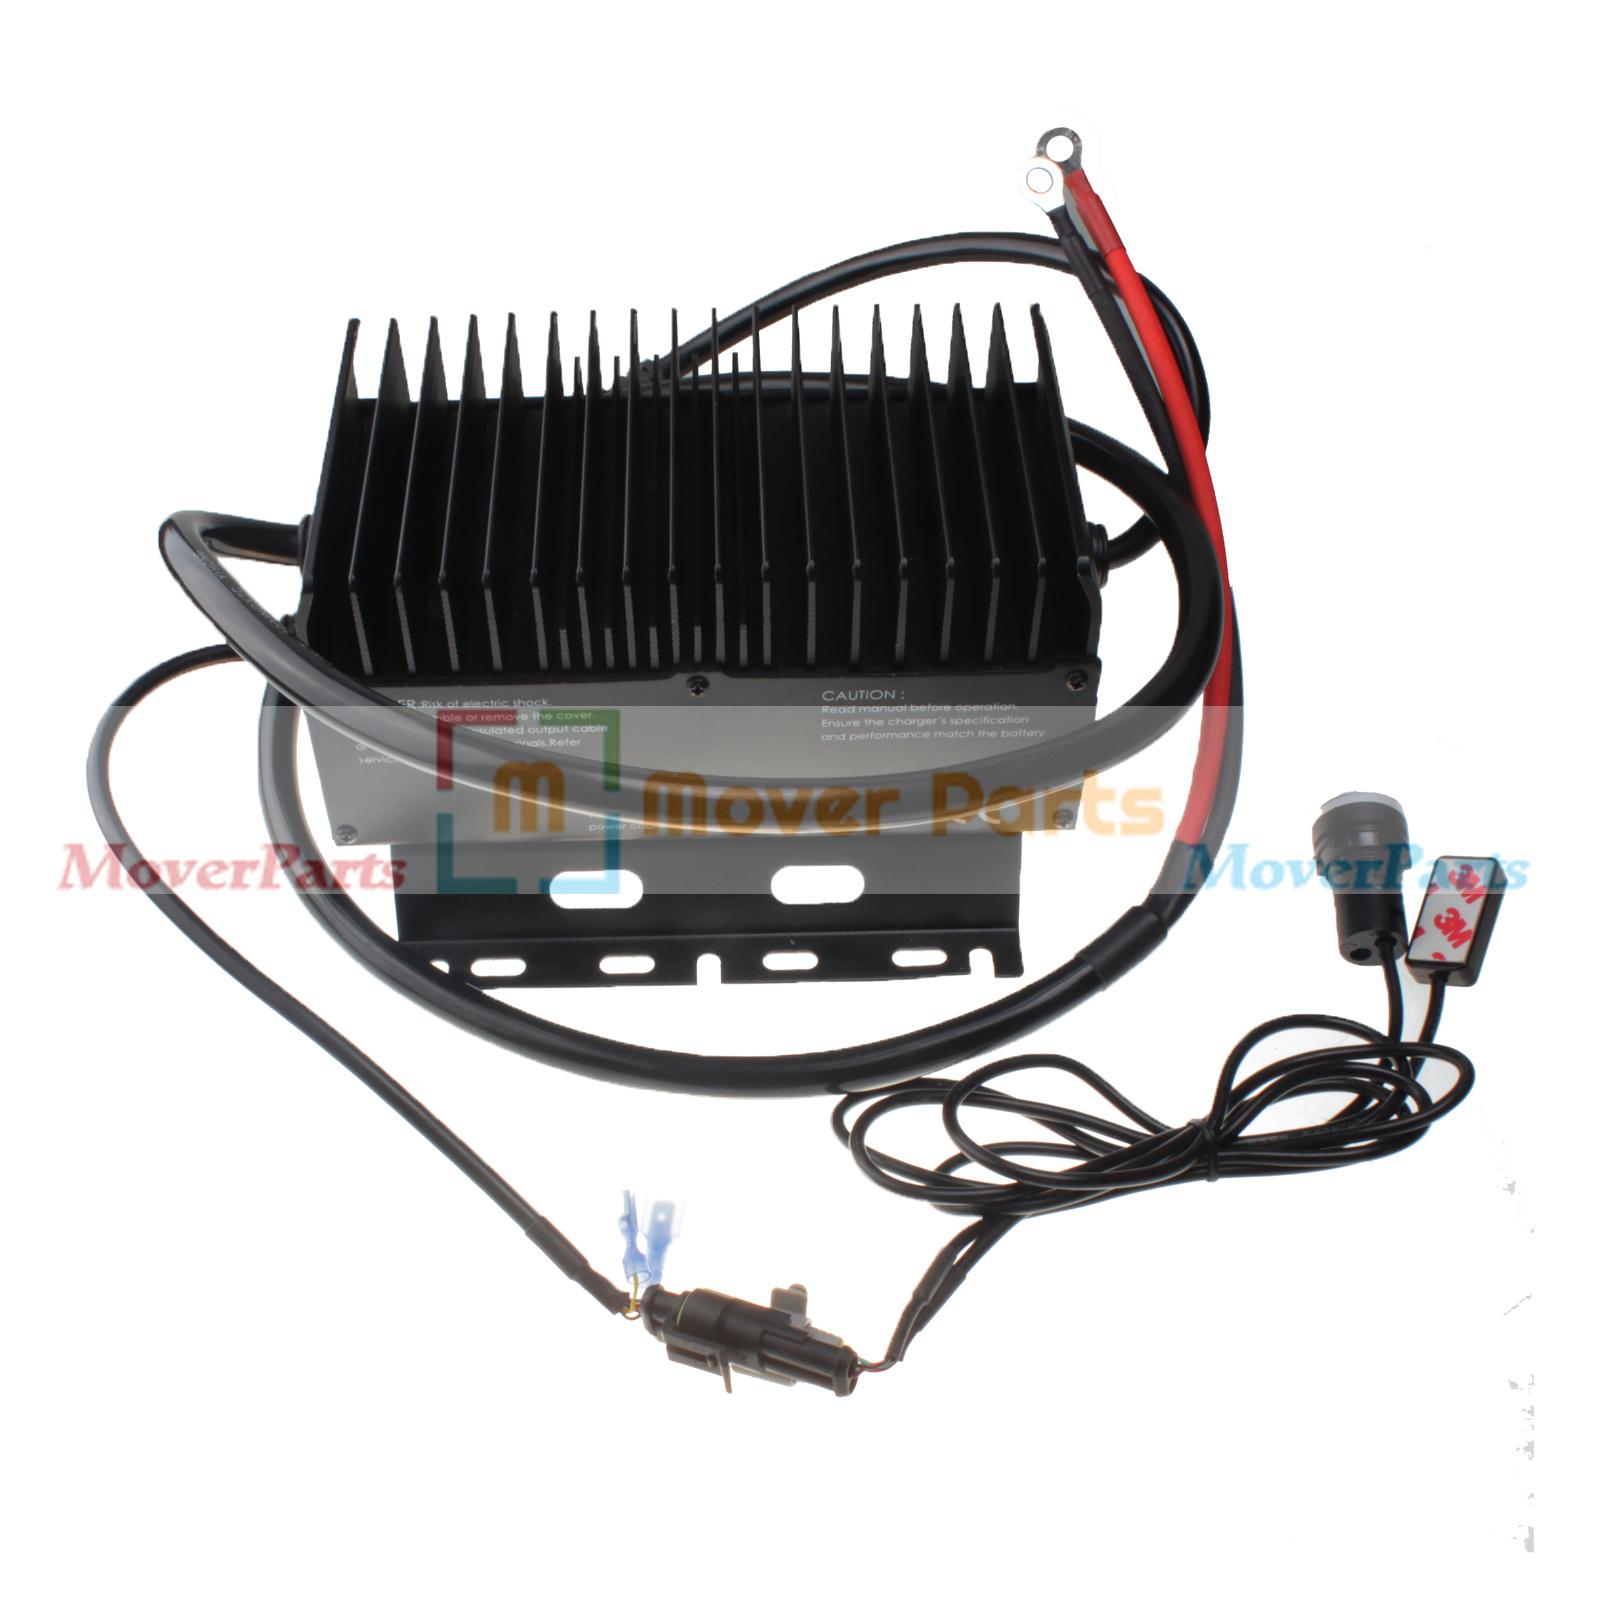 hight resolution of 24v 25a battery charger for jlg lift 1532e3 932e3 2033e3 2646e3 3246e3